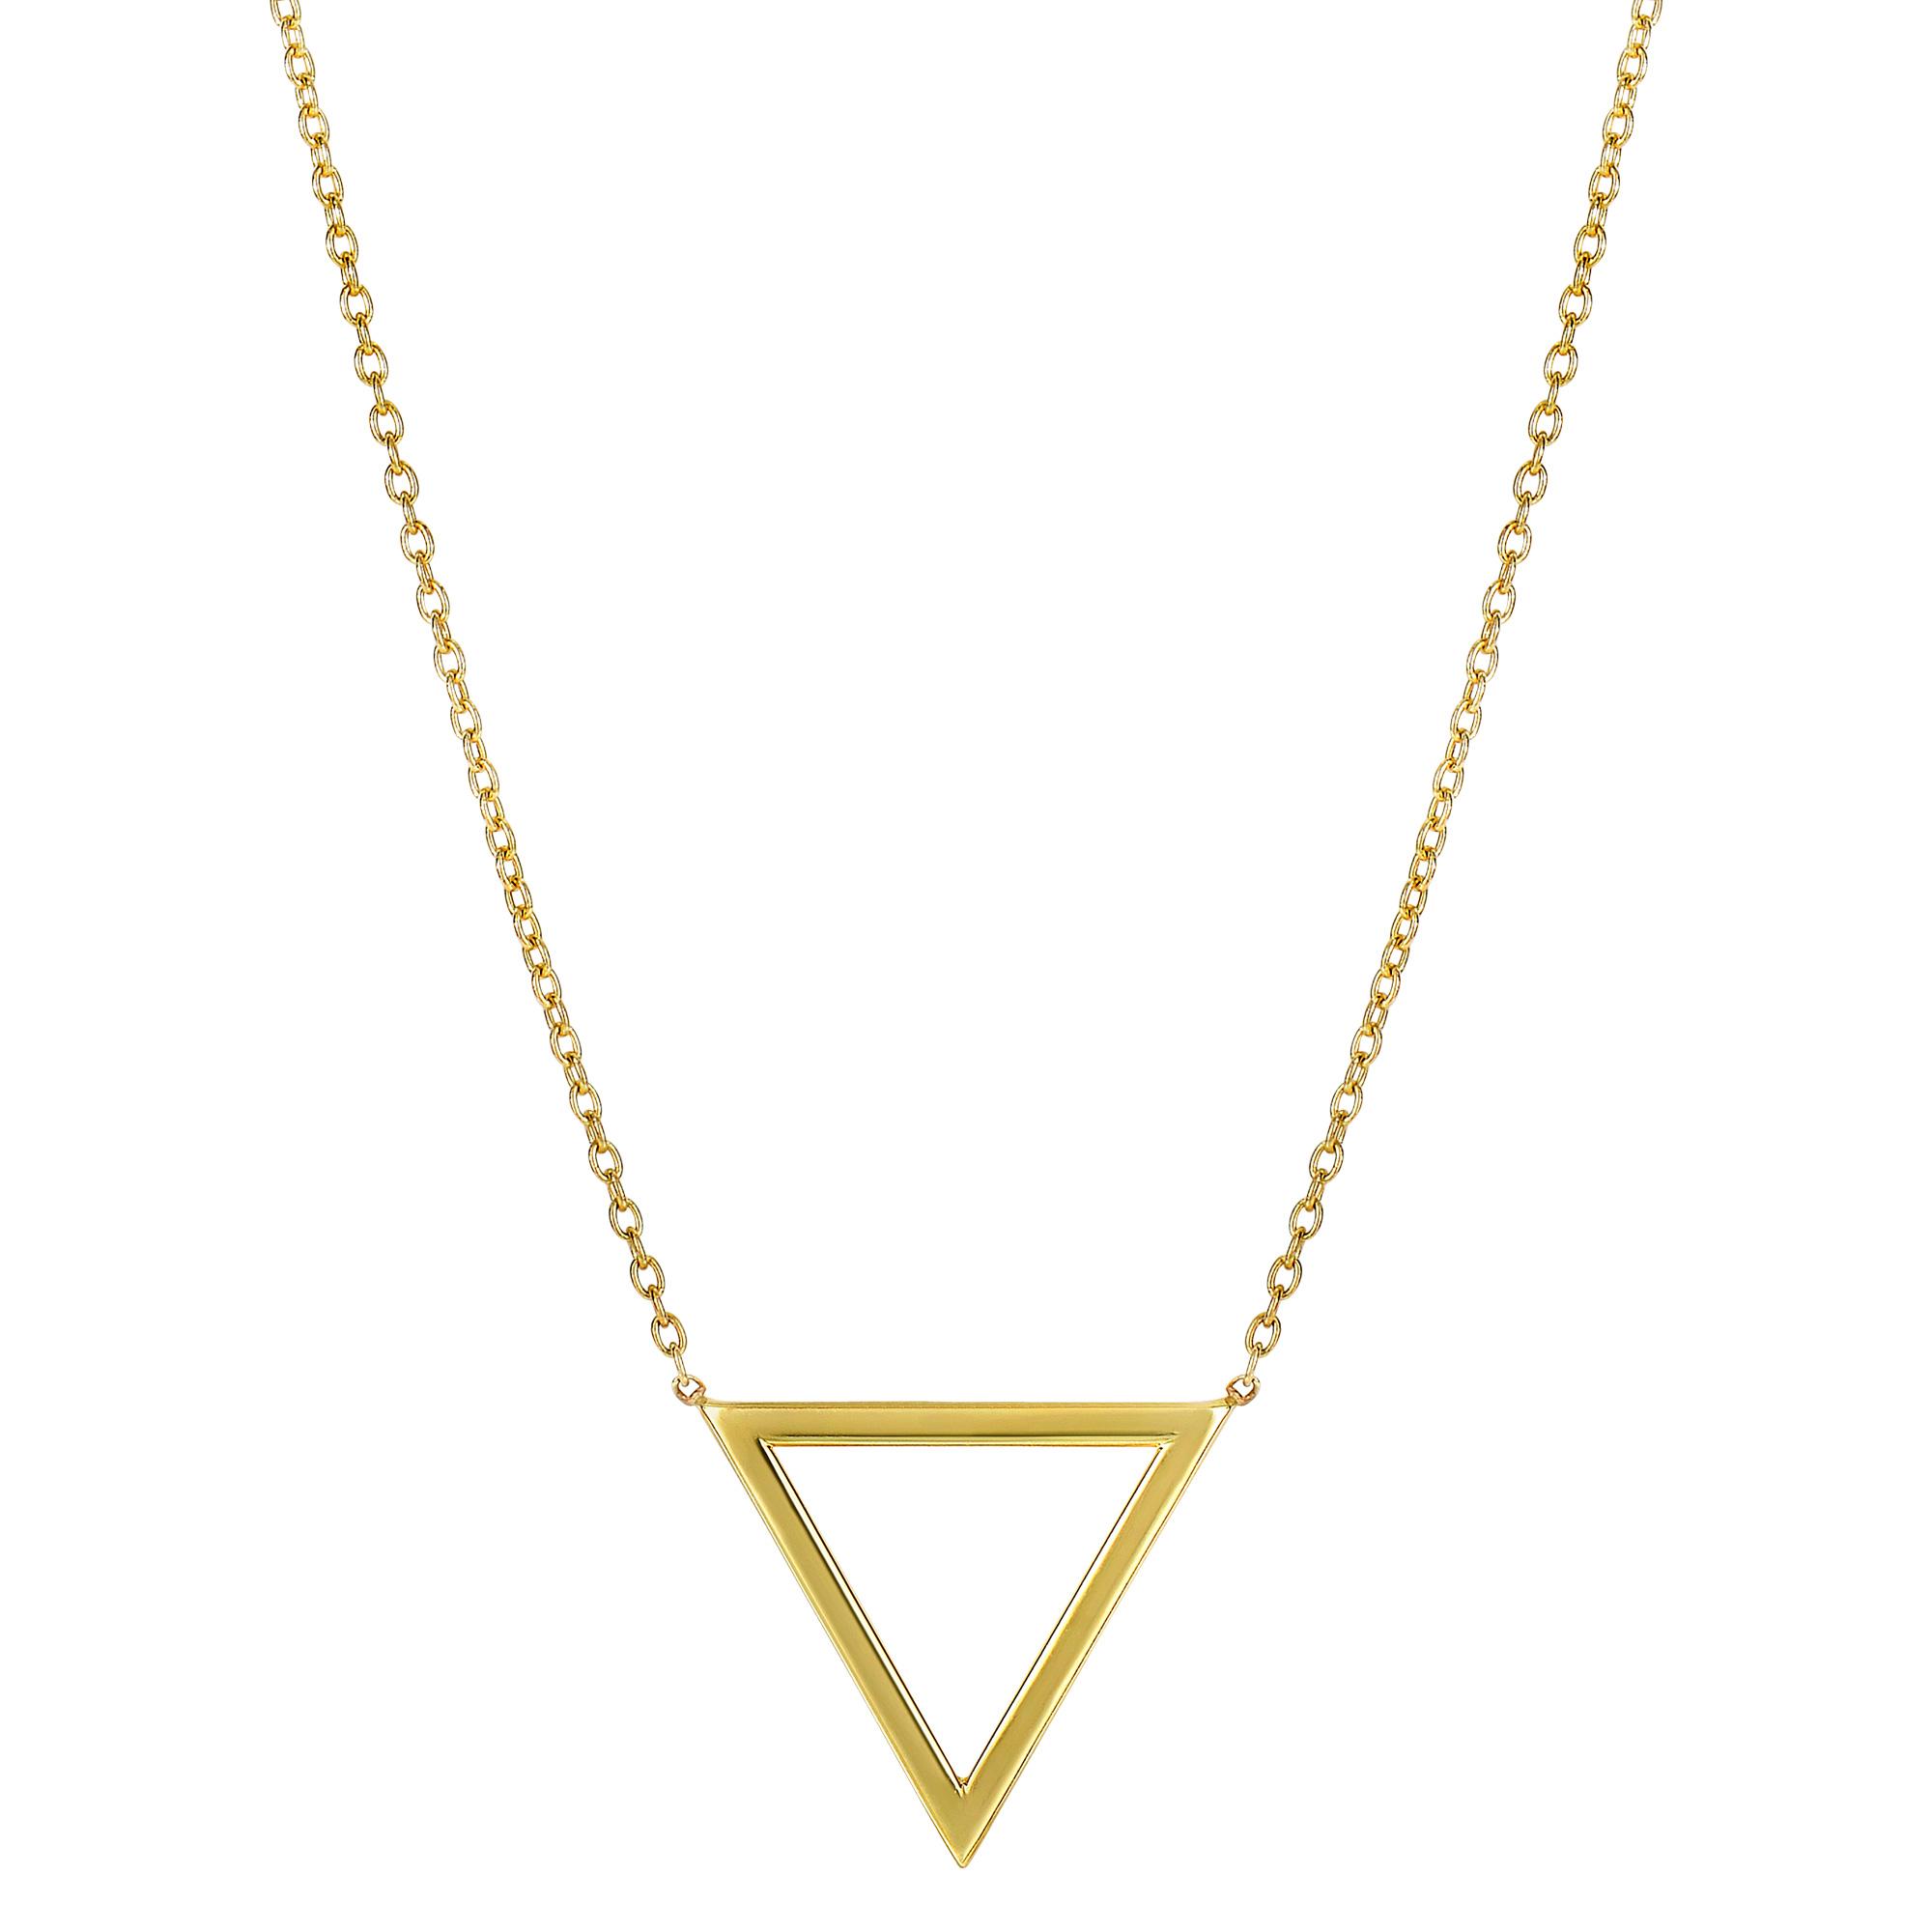 "JewelryAffairs 14k Yellow Gold Triangle Delta Symbol Pendant On 18"" Necklace by JewelryAffairs"